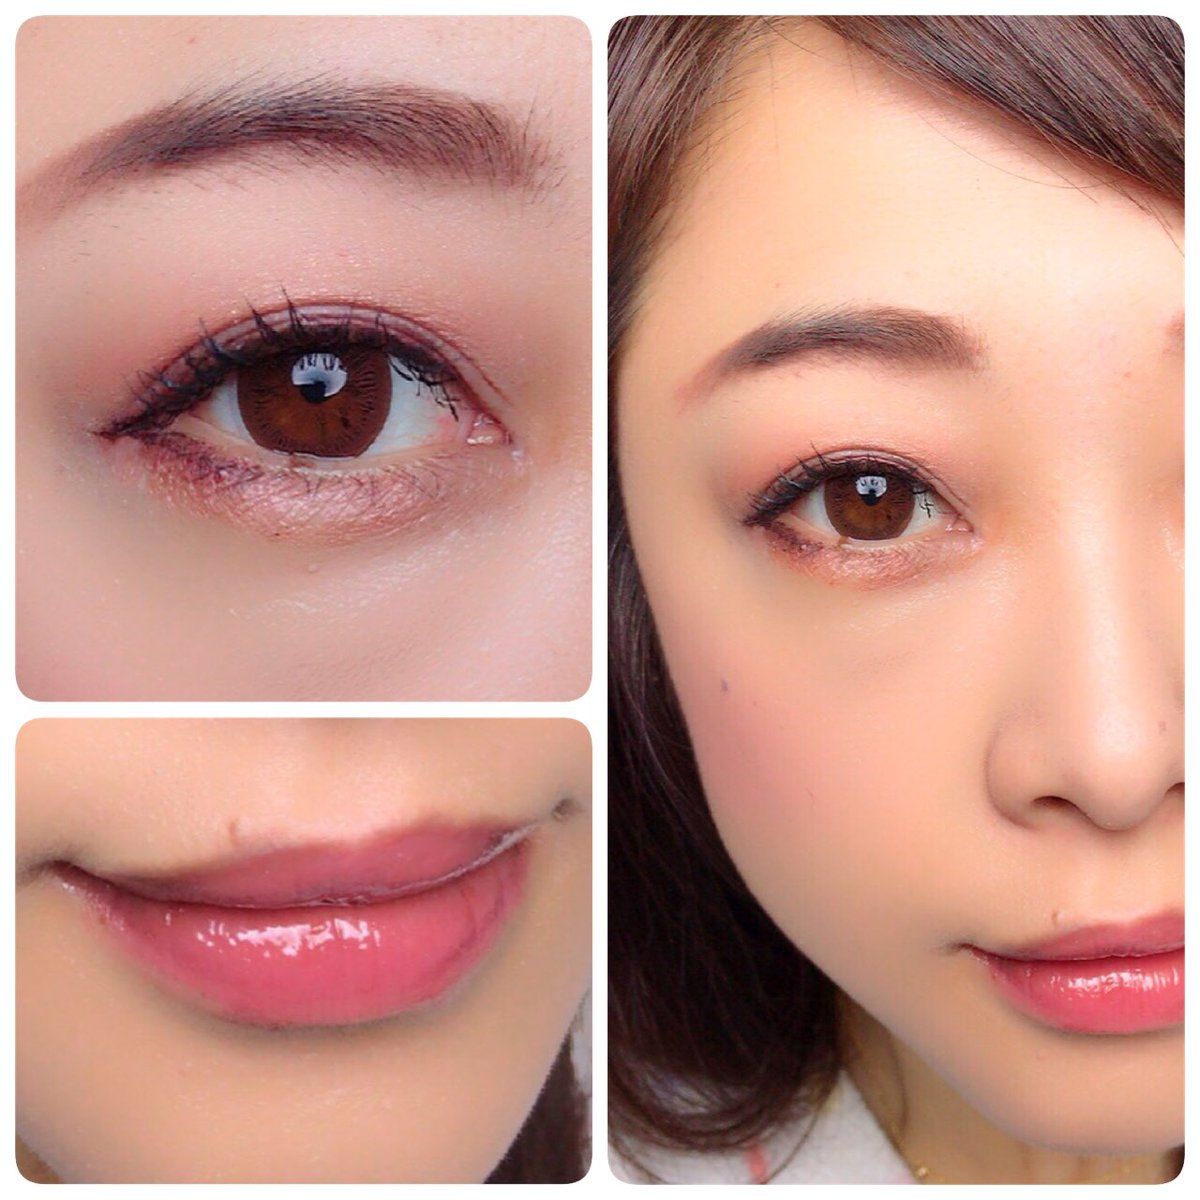 premium selection 0681b e97b7 kk♡イエベ秋strong 2nd 春vivid Twitter પર: